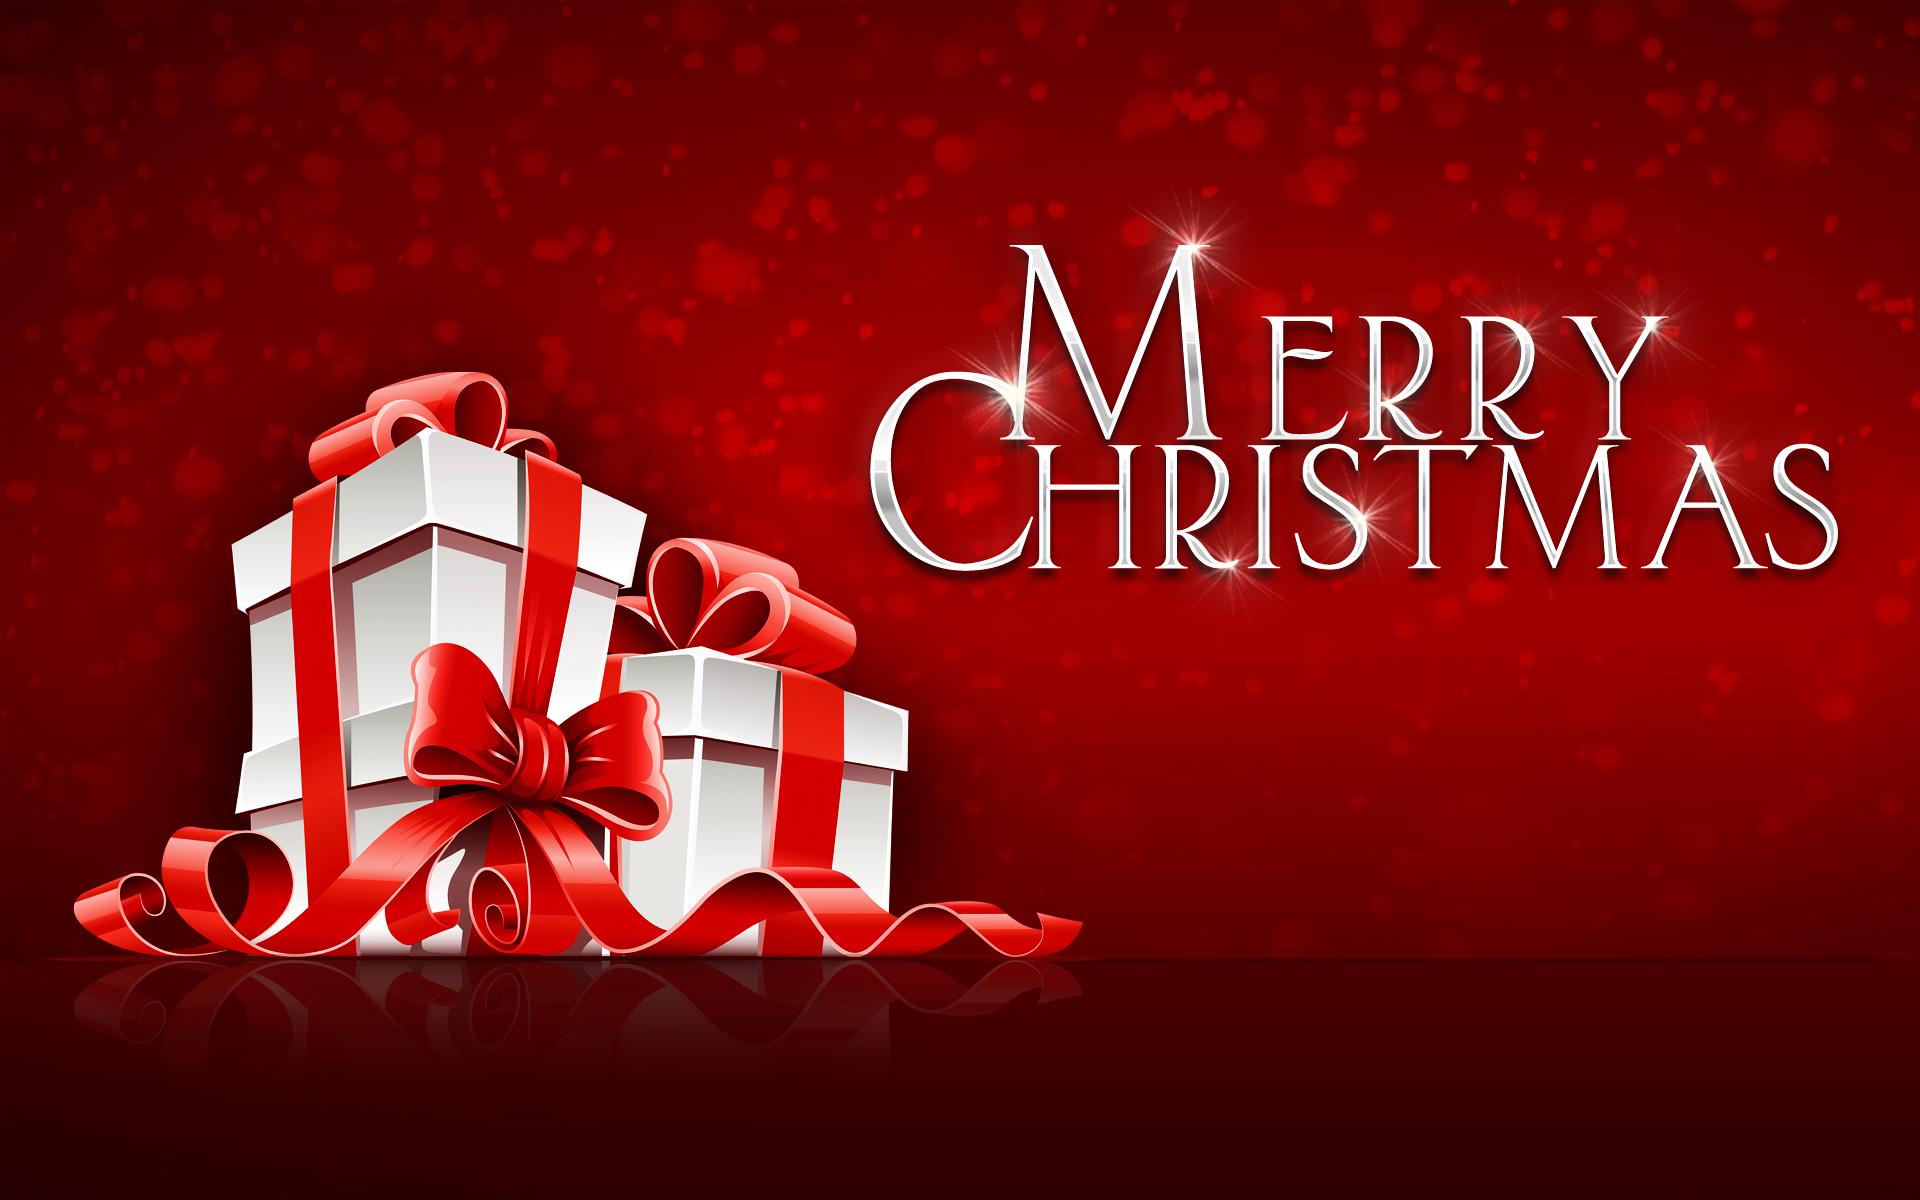 Merry Christmas 2012 1920x1200